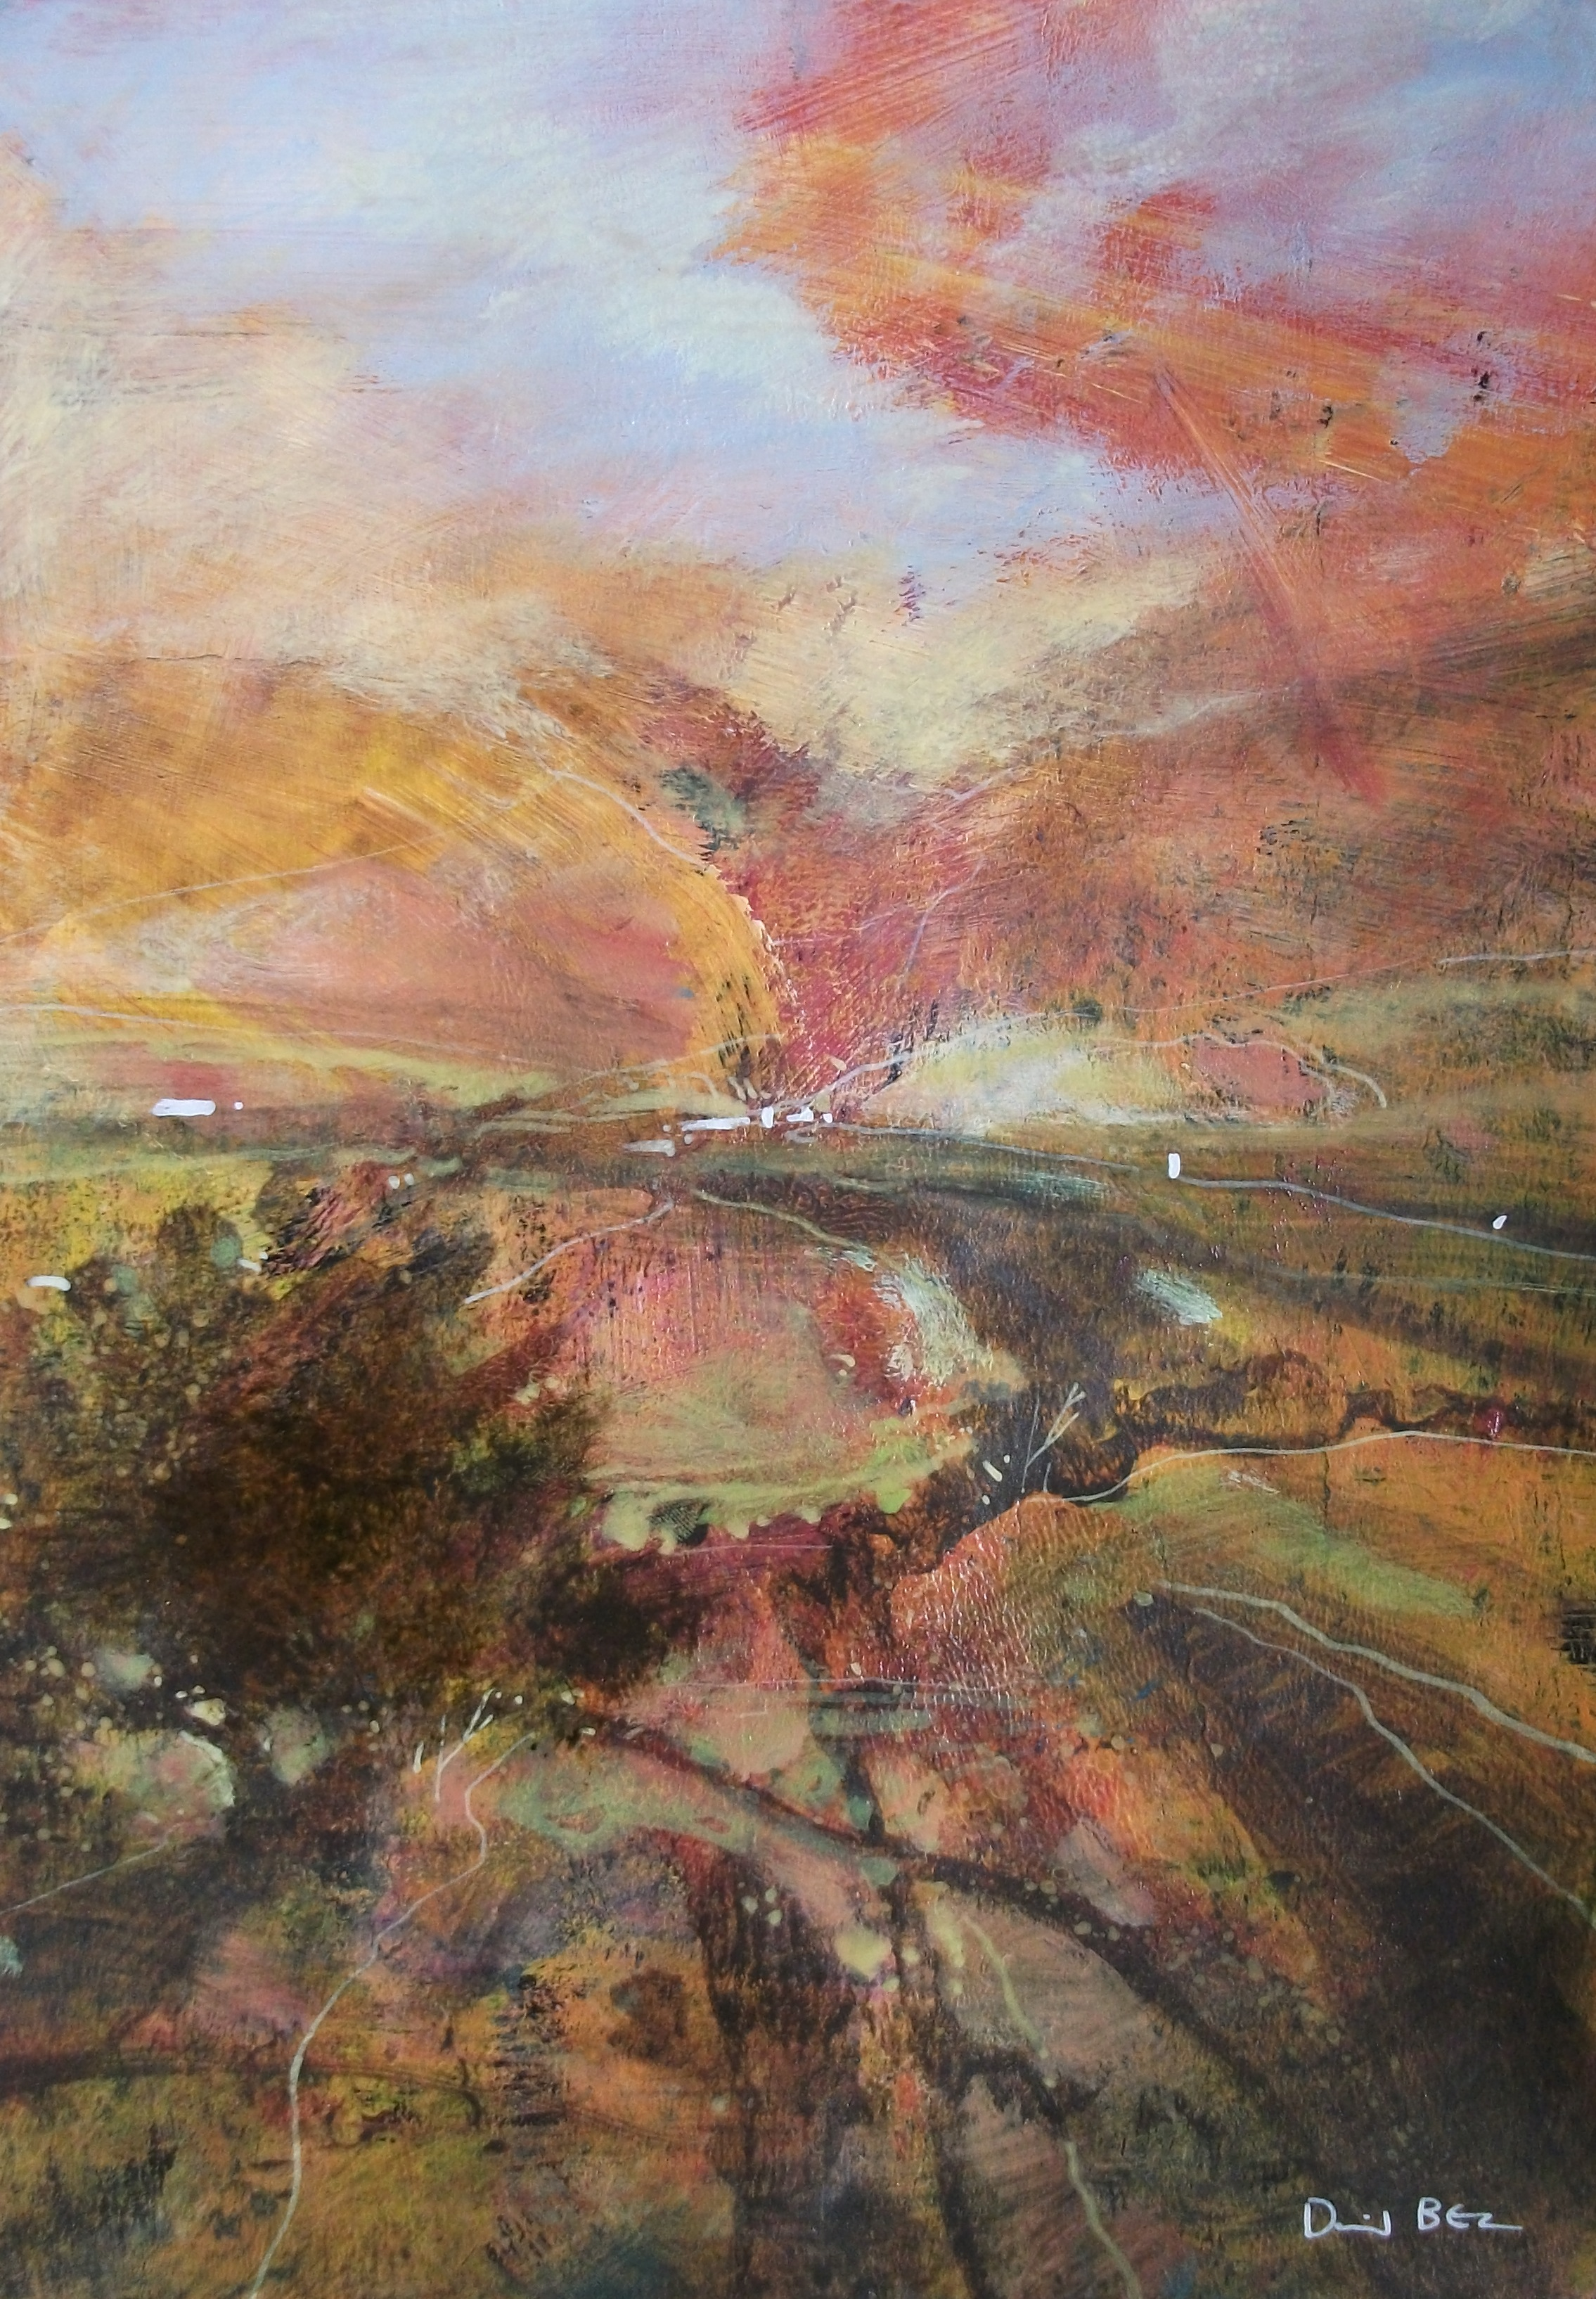 "'Cumbria' ,  Code no. L430   Acrylics & Mixed Media on Paper with Oil Glazing, 12"" x8"""